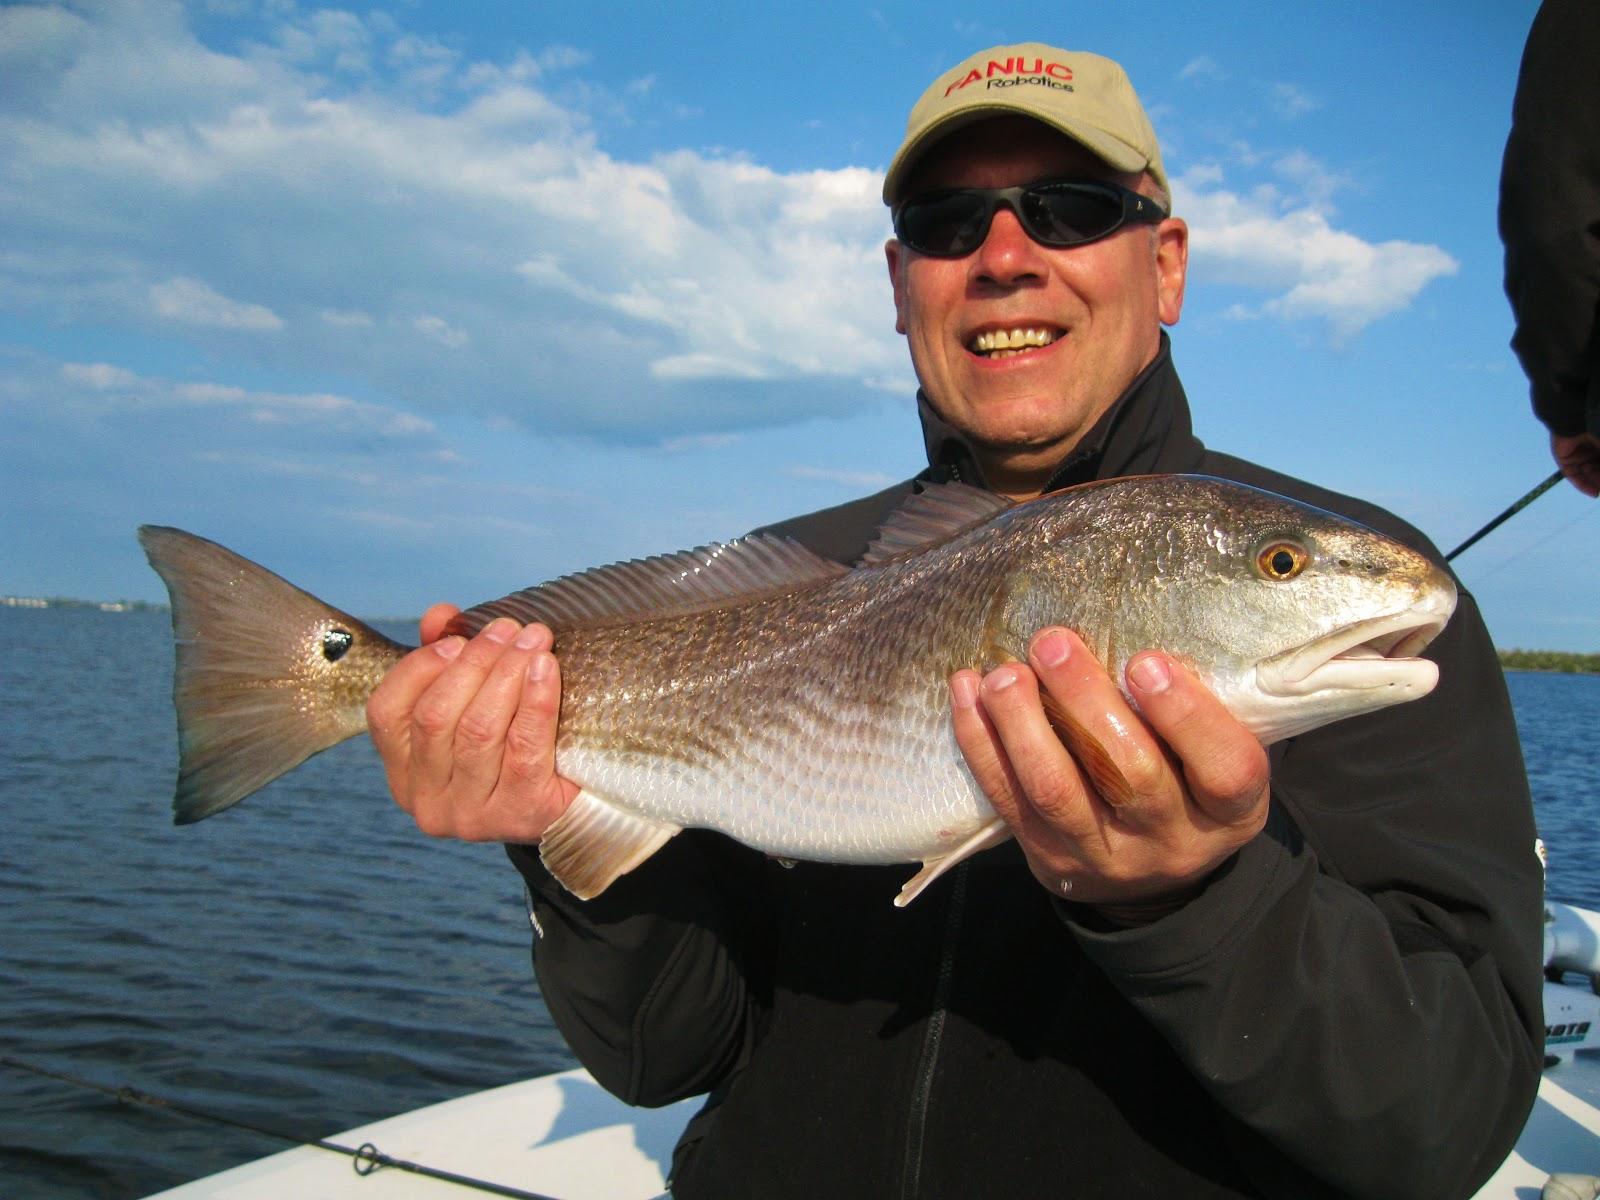 The pine island angler pine island fishing report water for Pine island fishing charters